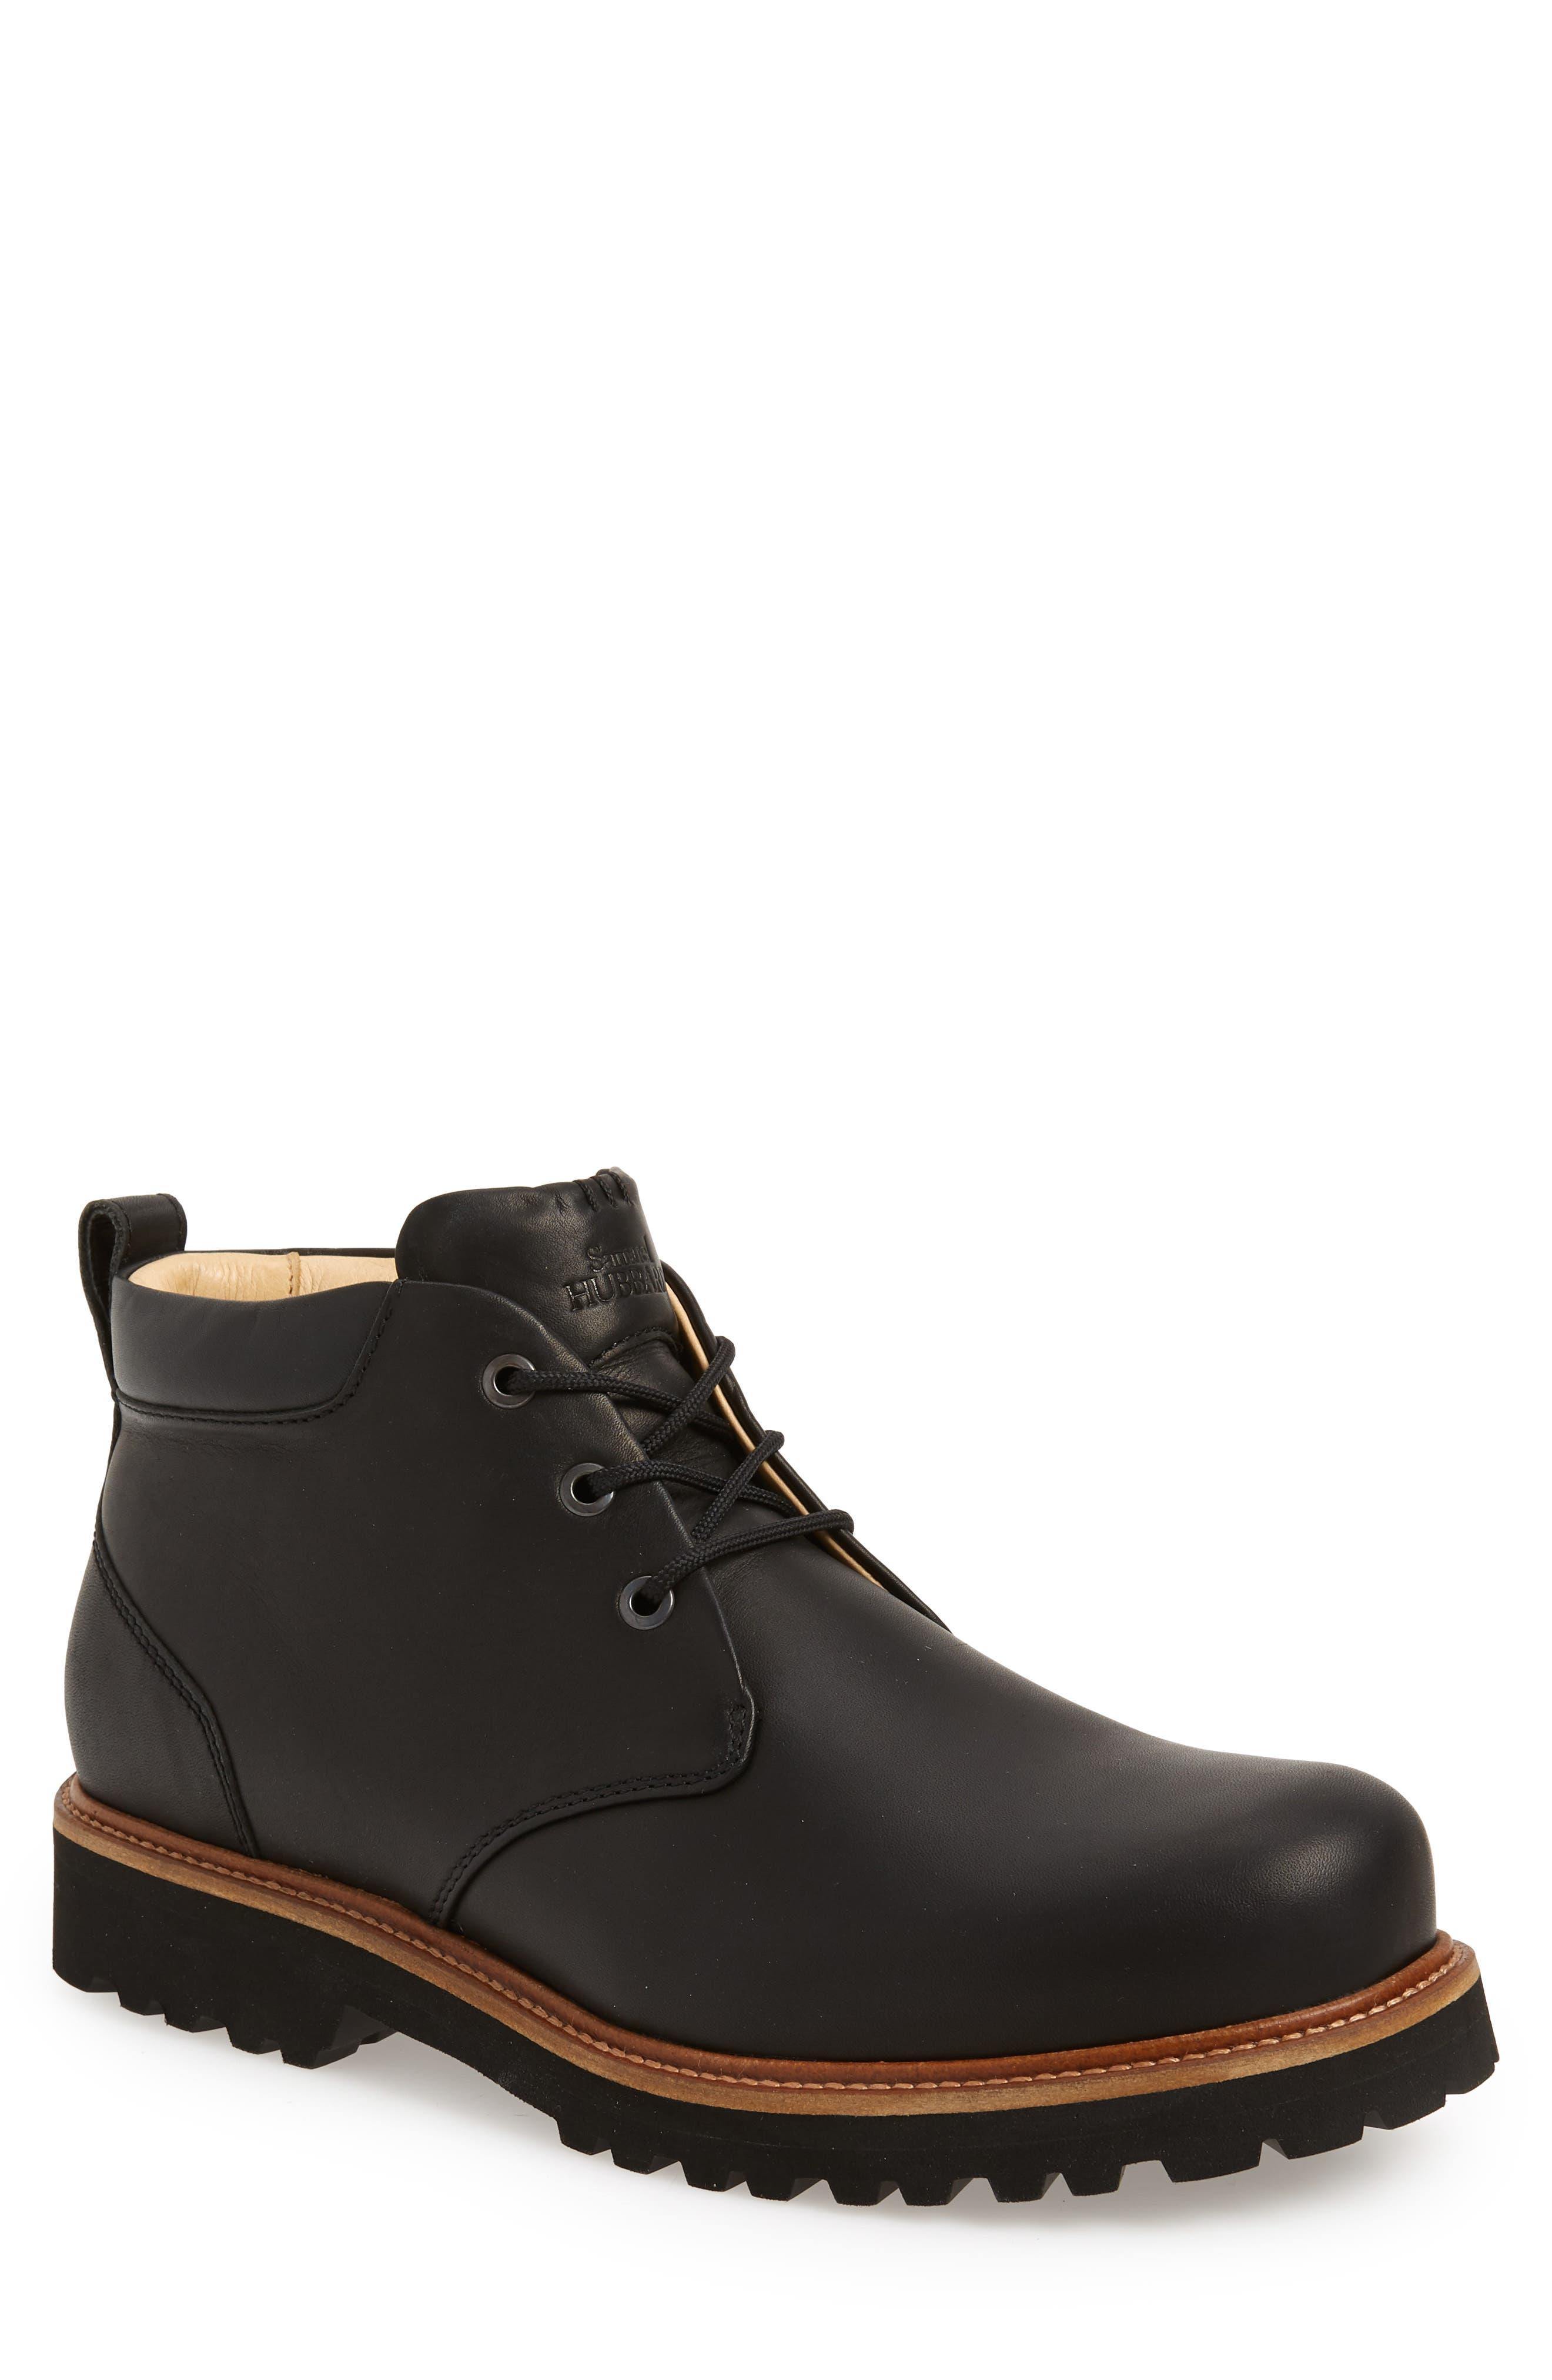 Samuel Hubbard Northcoast Chukka Boot, Black